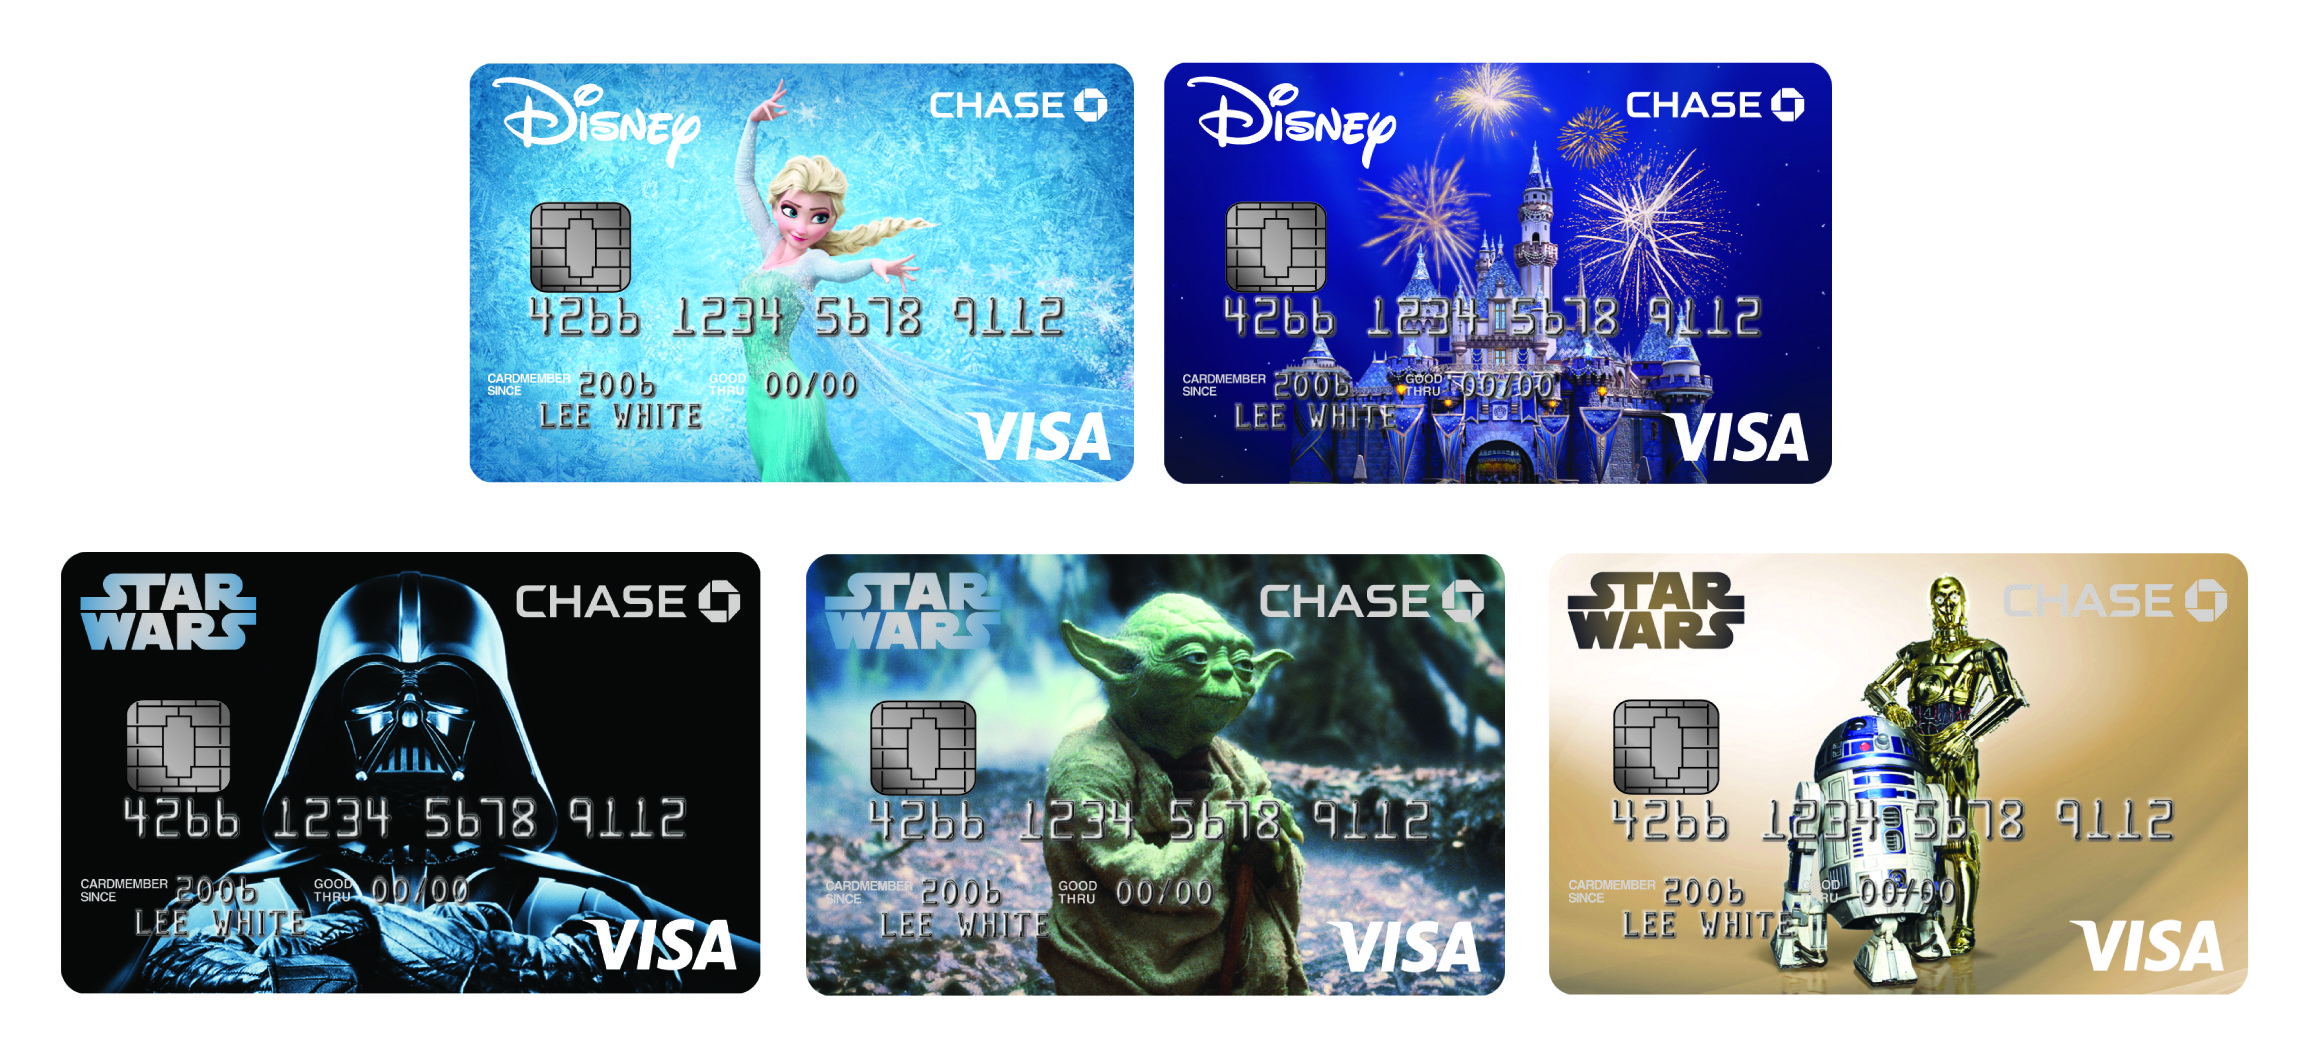 New Chase Debit Card Design